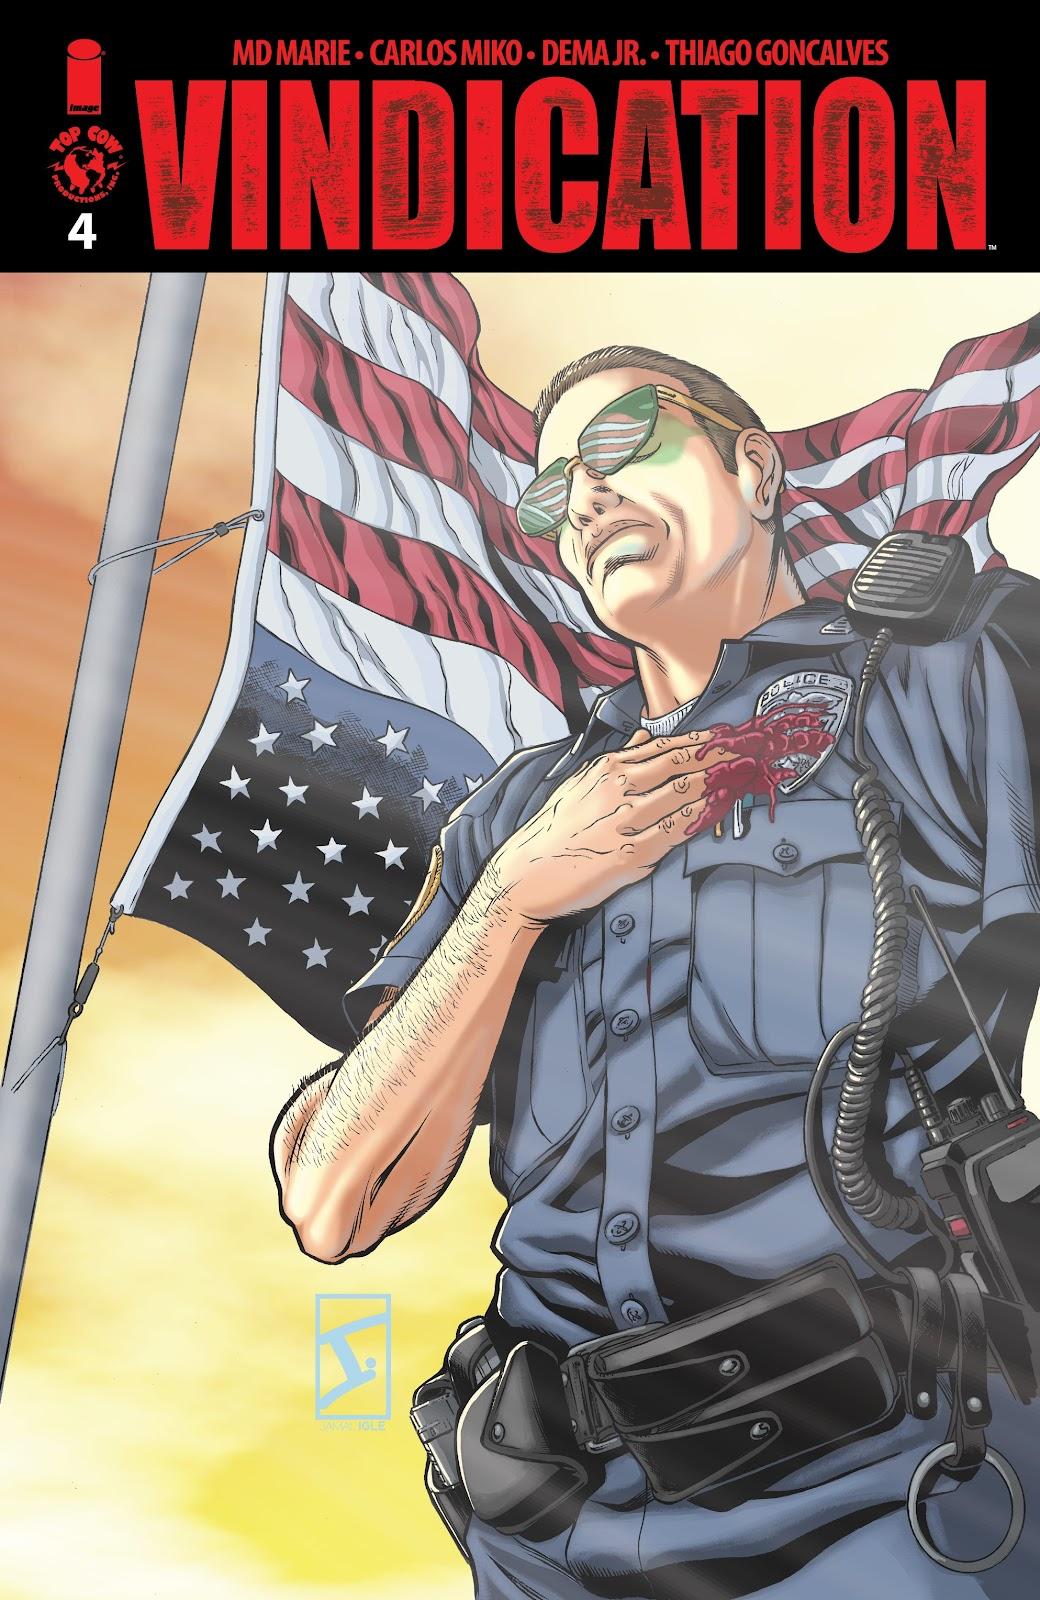 Read online Vindication comic -  Issue #4 - 1